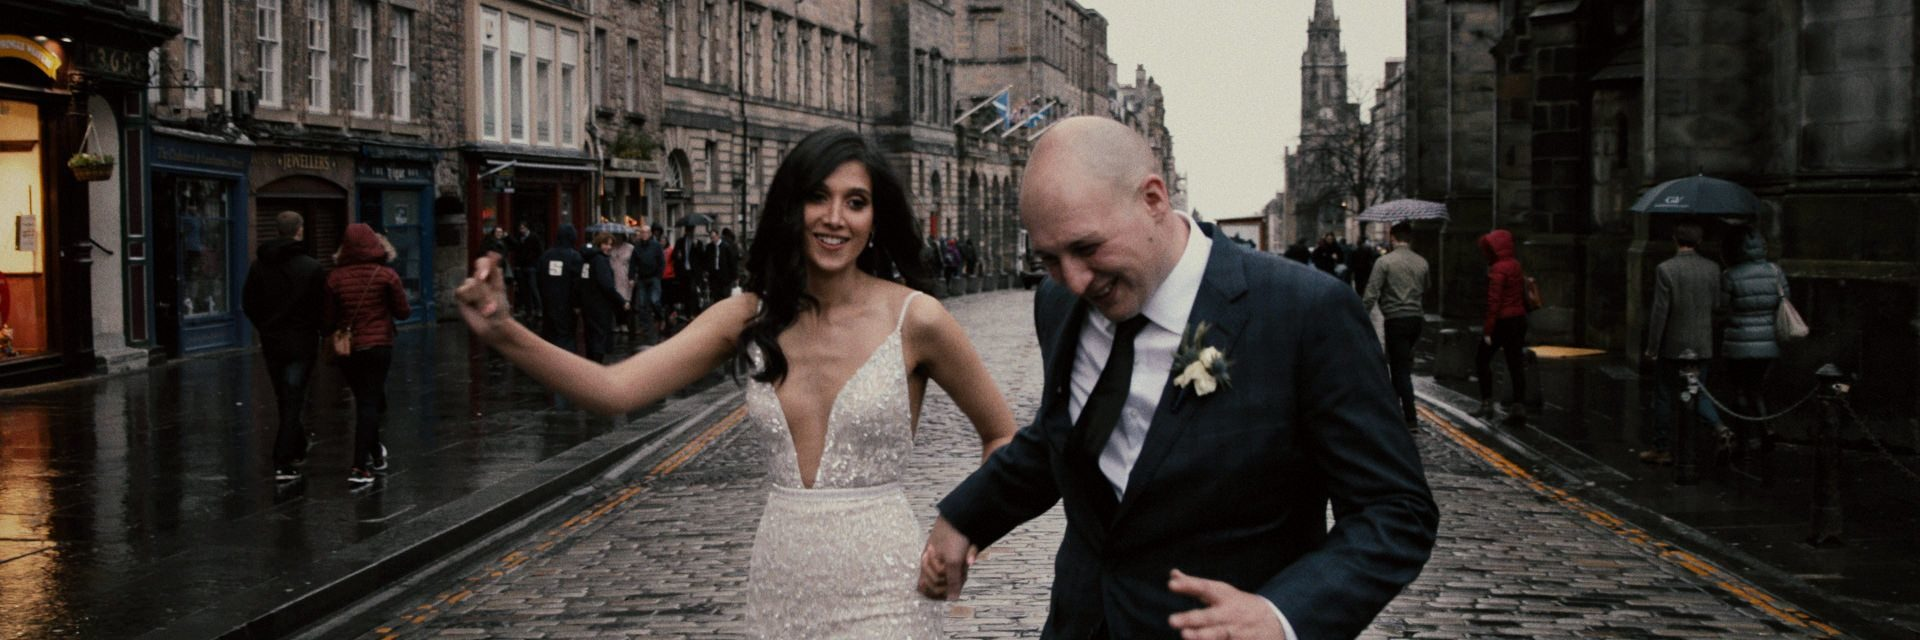 Sintra-wedding-videographer-cinemate-films-04